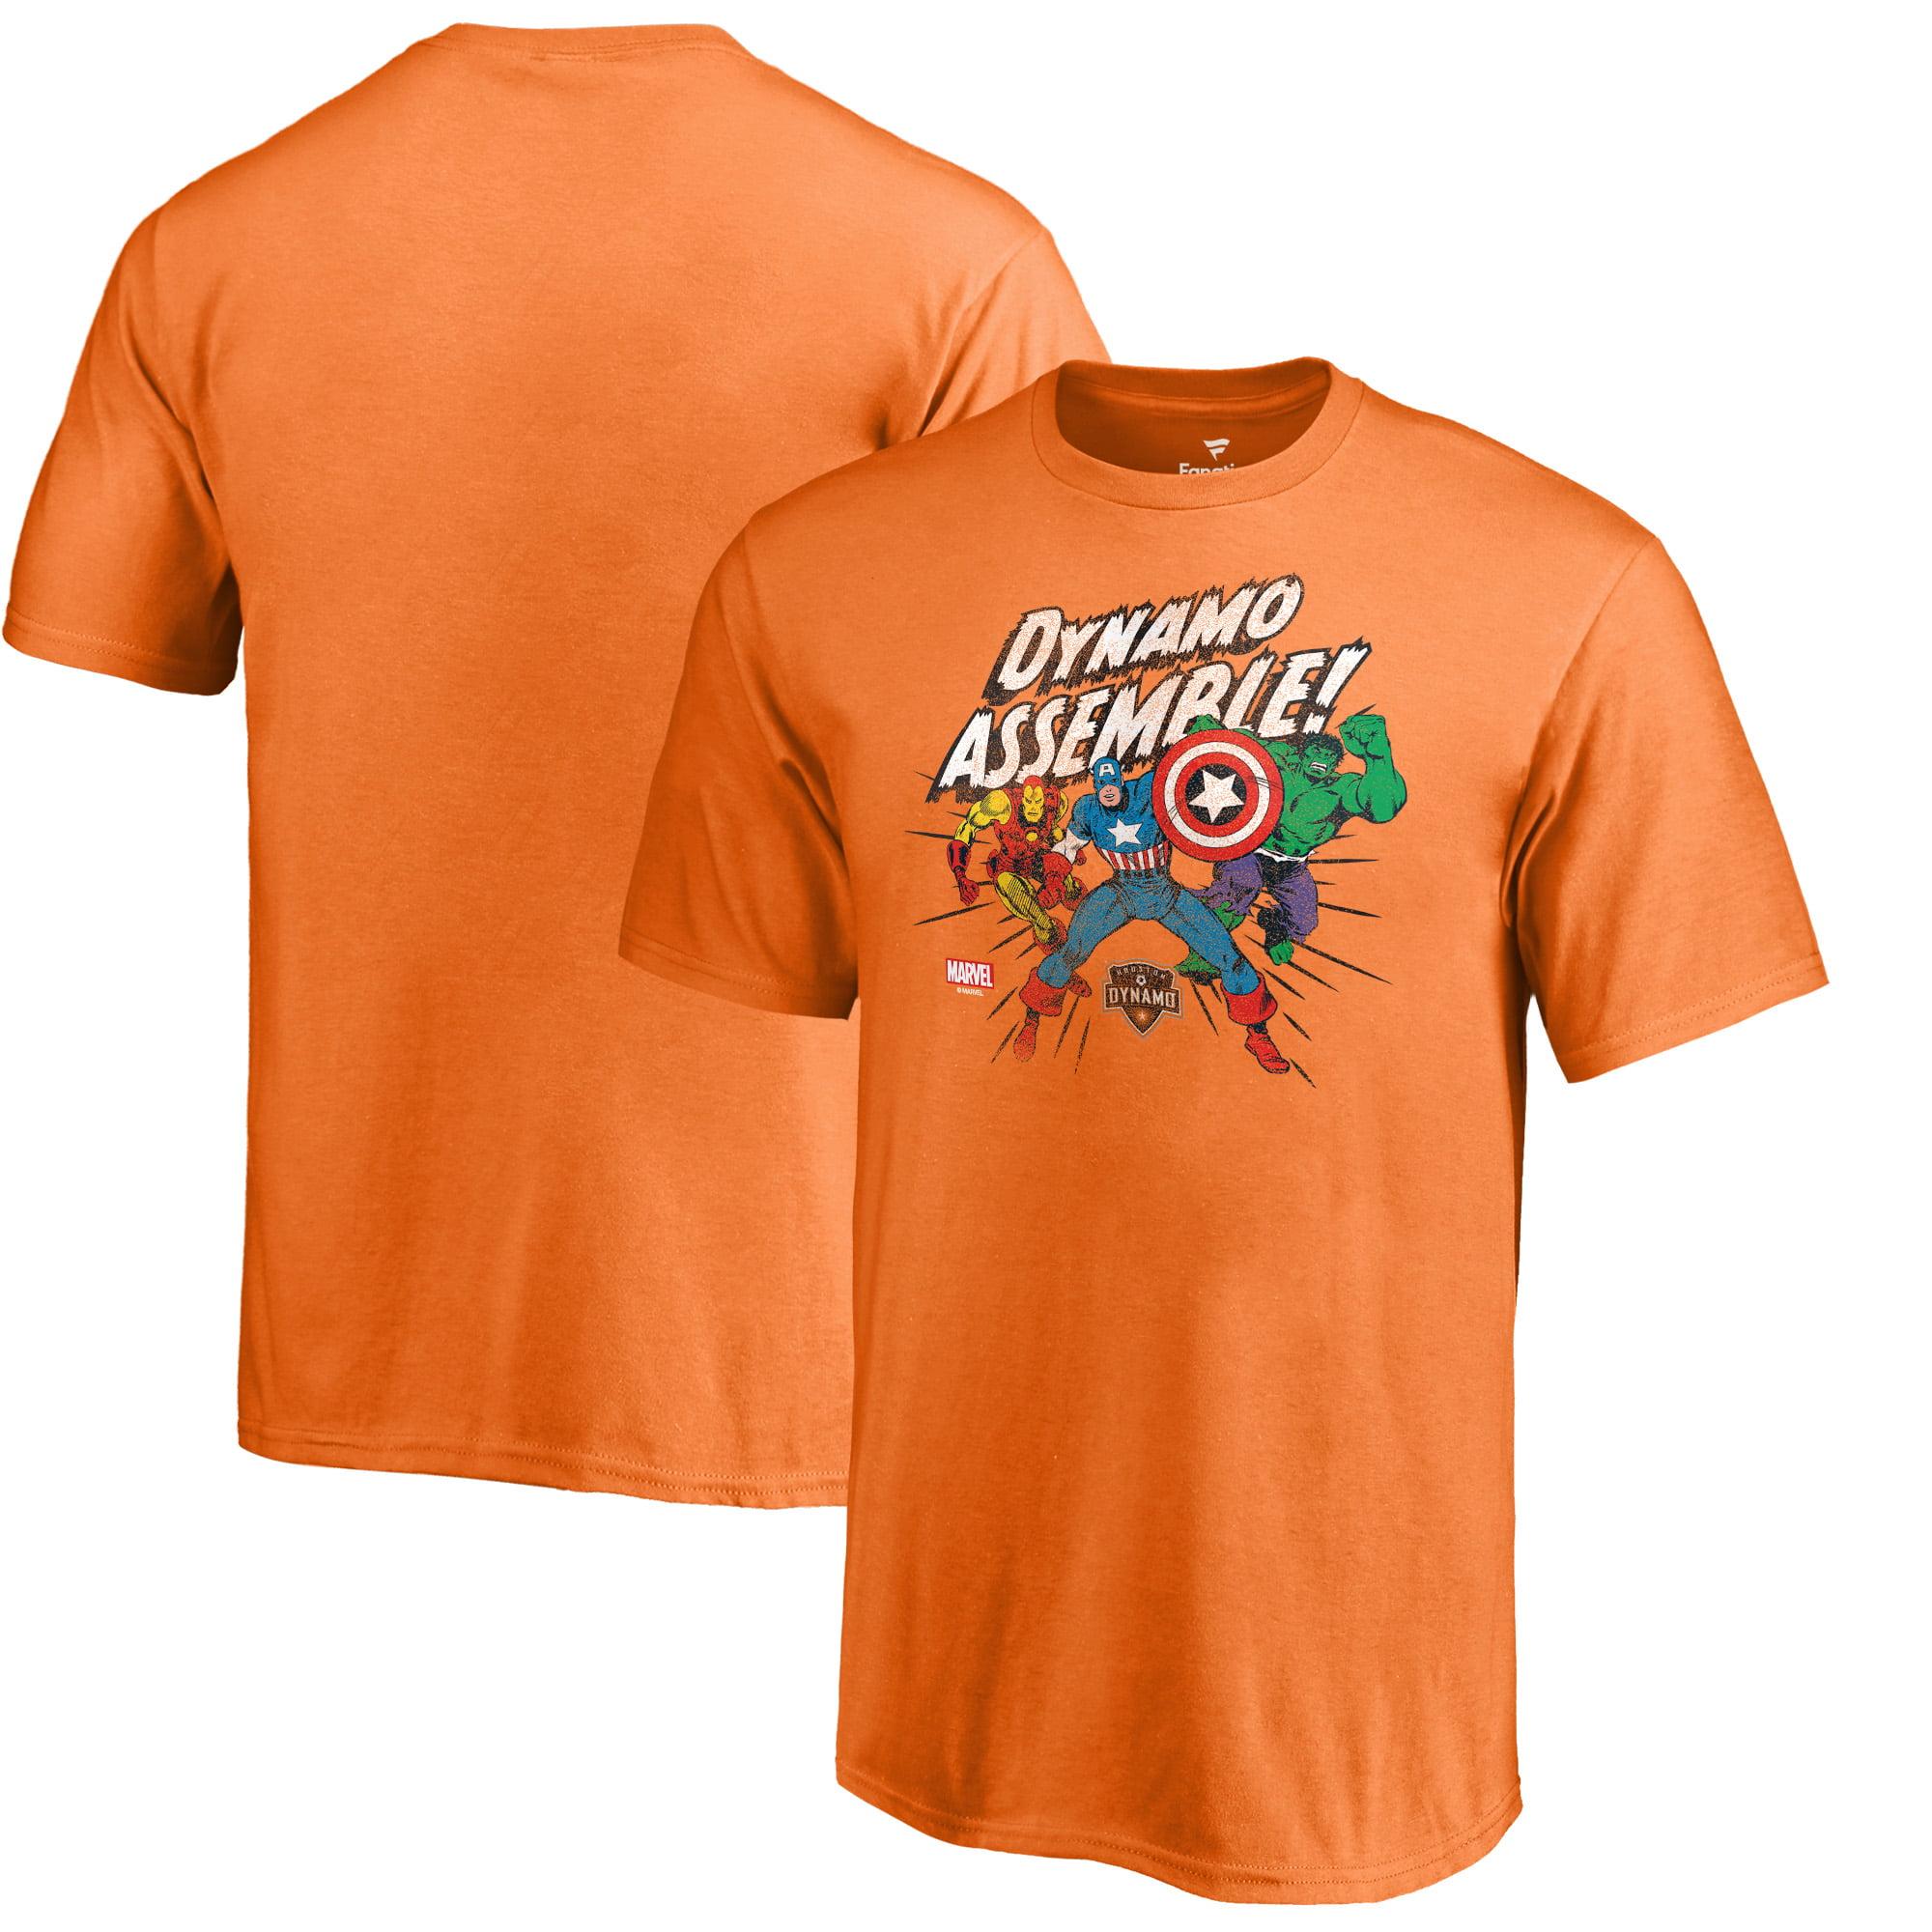 Houston Dynamo Fanatics Branded Youth Marvel Avengers Assemble T-Shirt - Tenn Orange